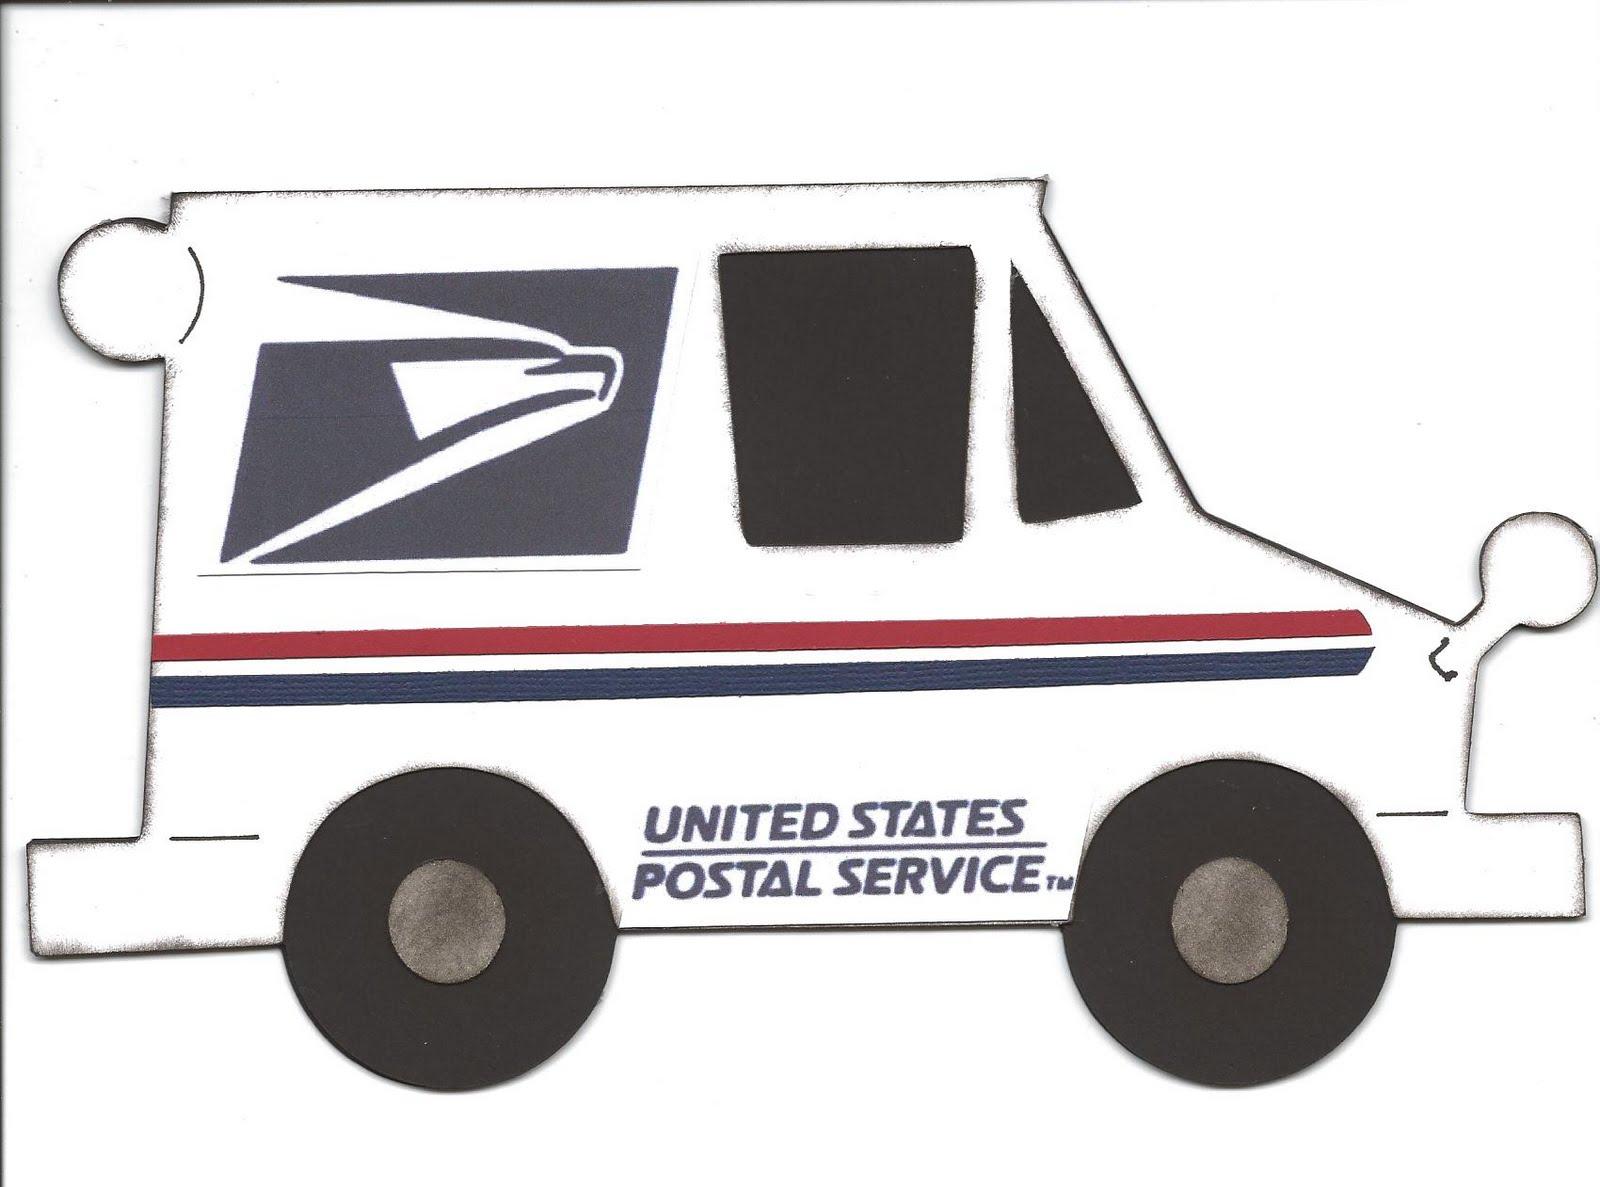 Free Postal Cliparts, Download Free Clip Art, Free Clip Art.